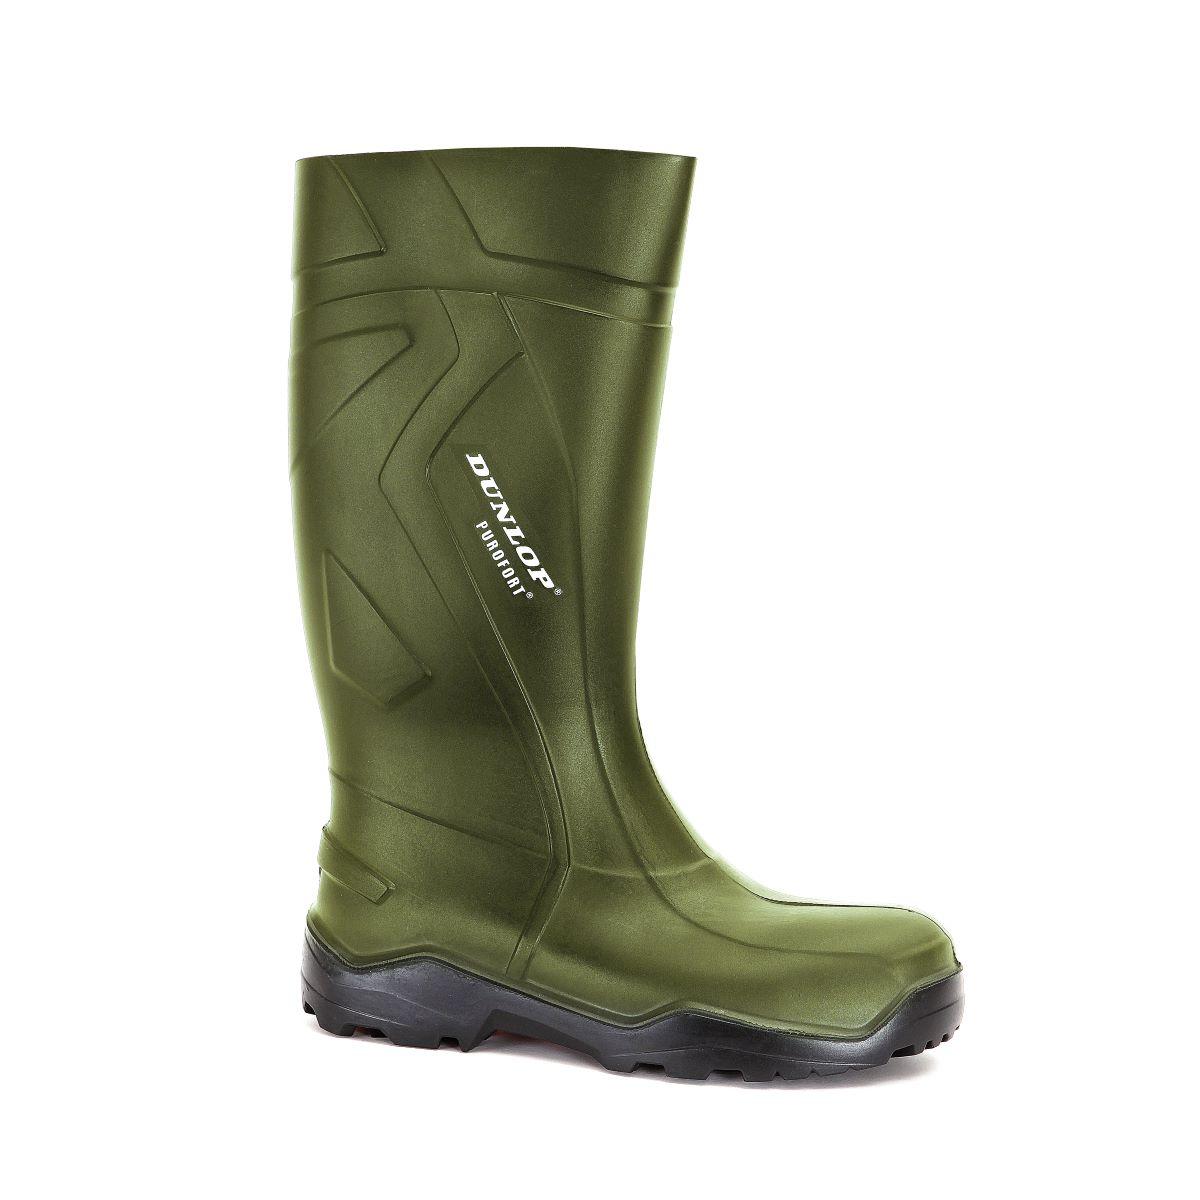 Acifort purofort+04 D760943 dunlop obuv pracovní zim. 37